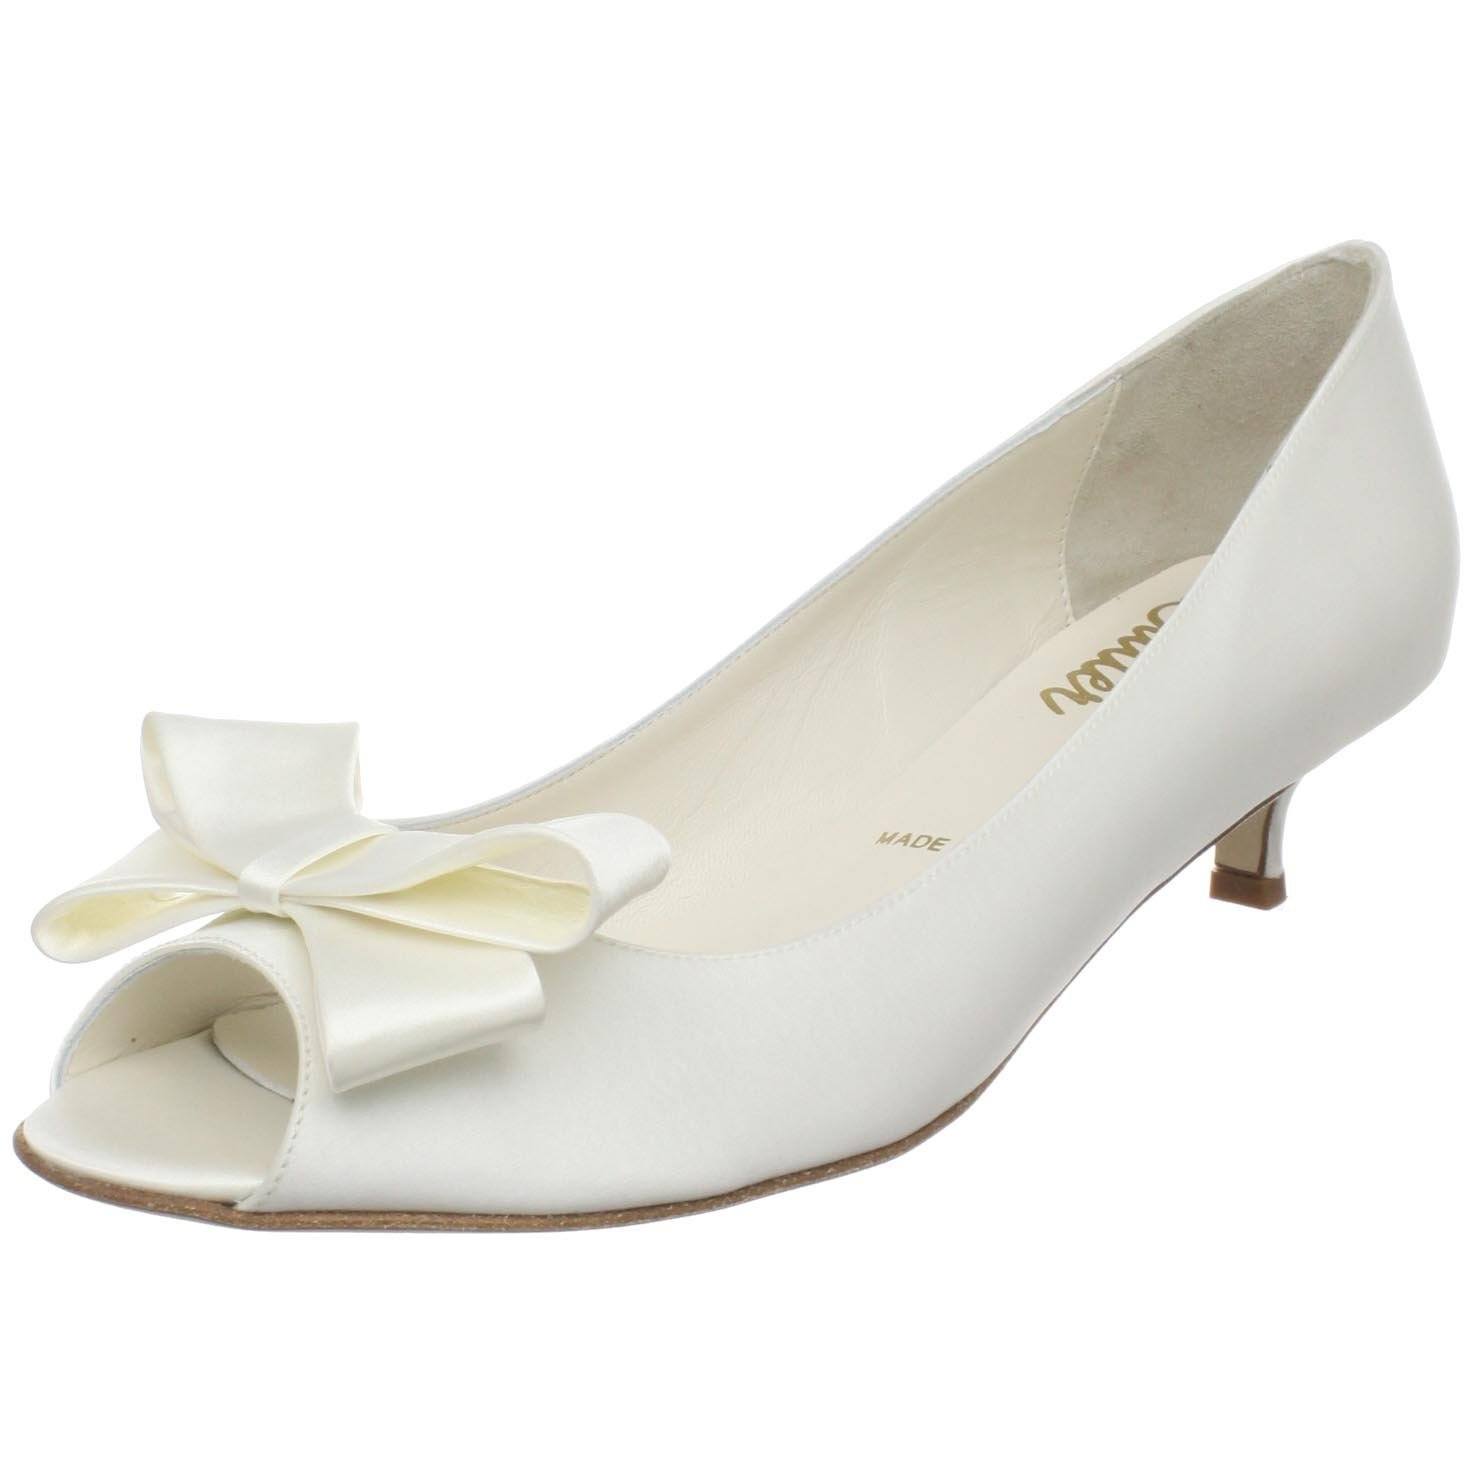 kitten heel bridal shoes photo - 1